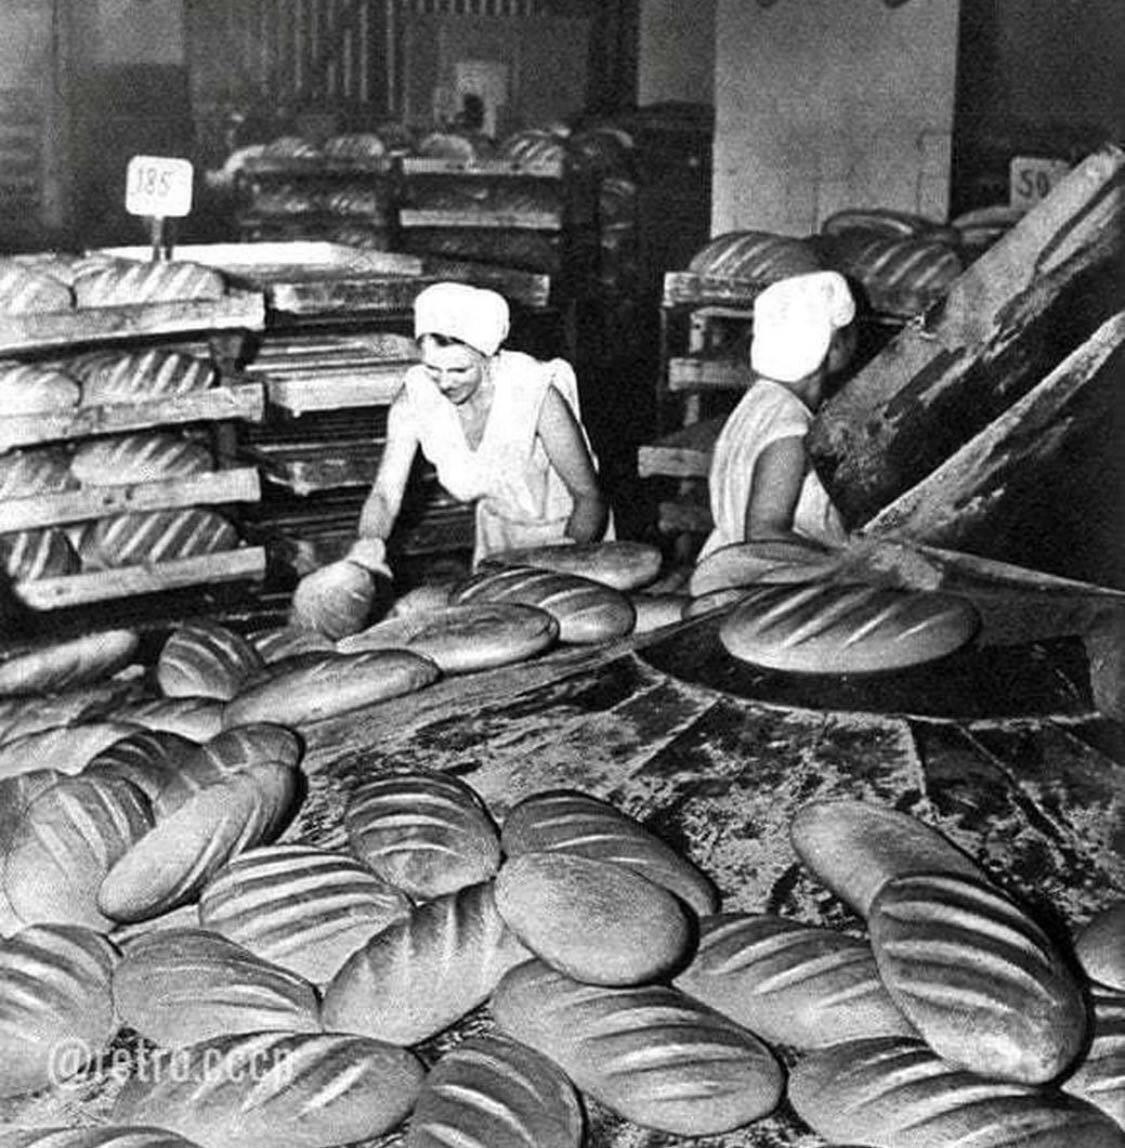 Фото с советской хлебопекарни